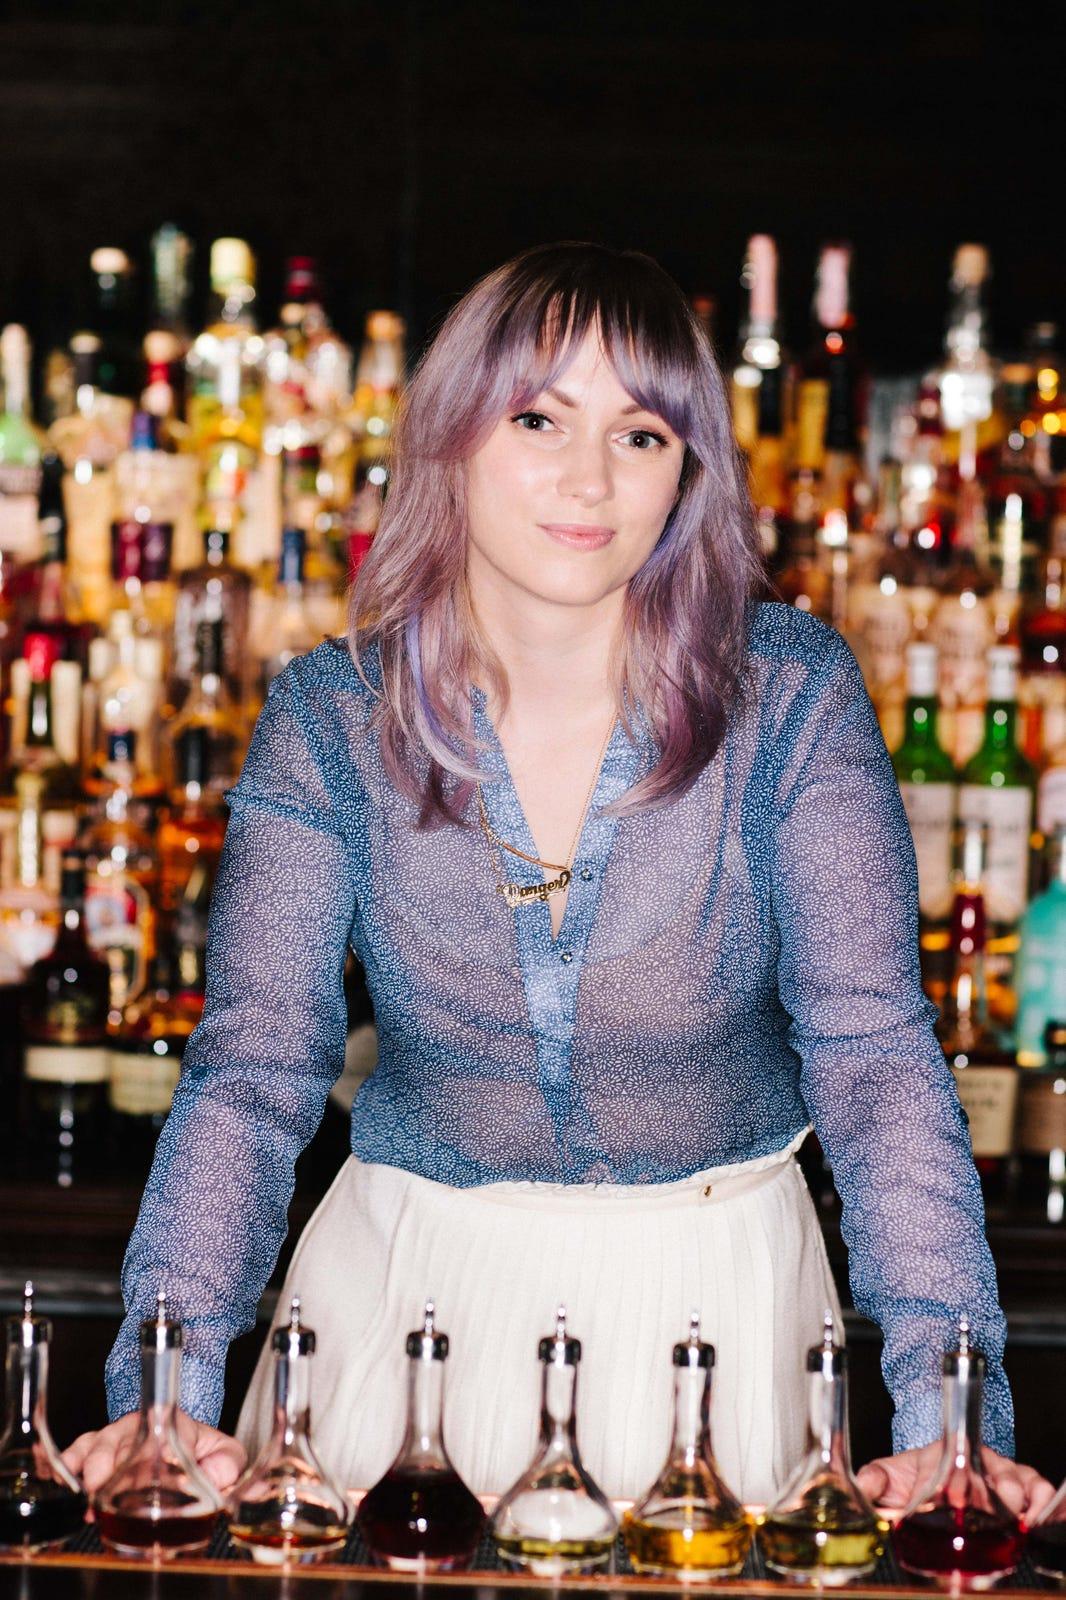 long lasting makeup tips bartender interviews